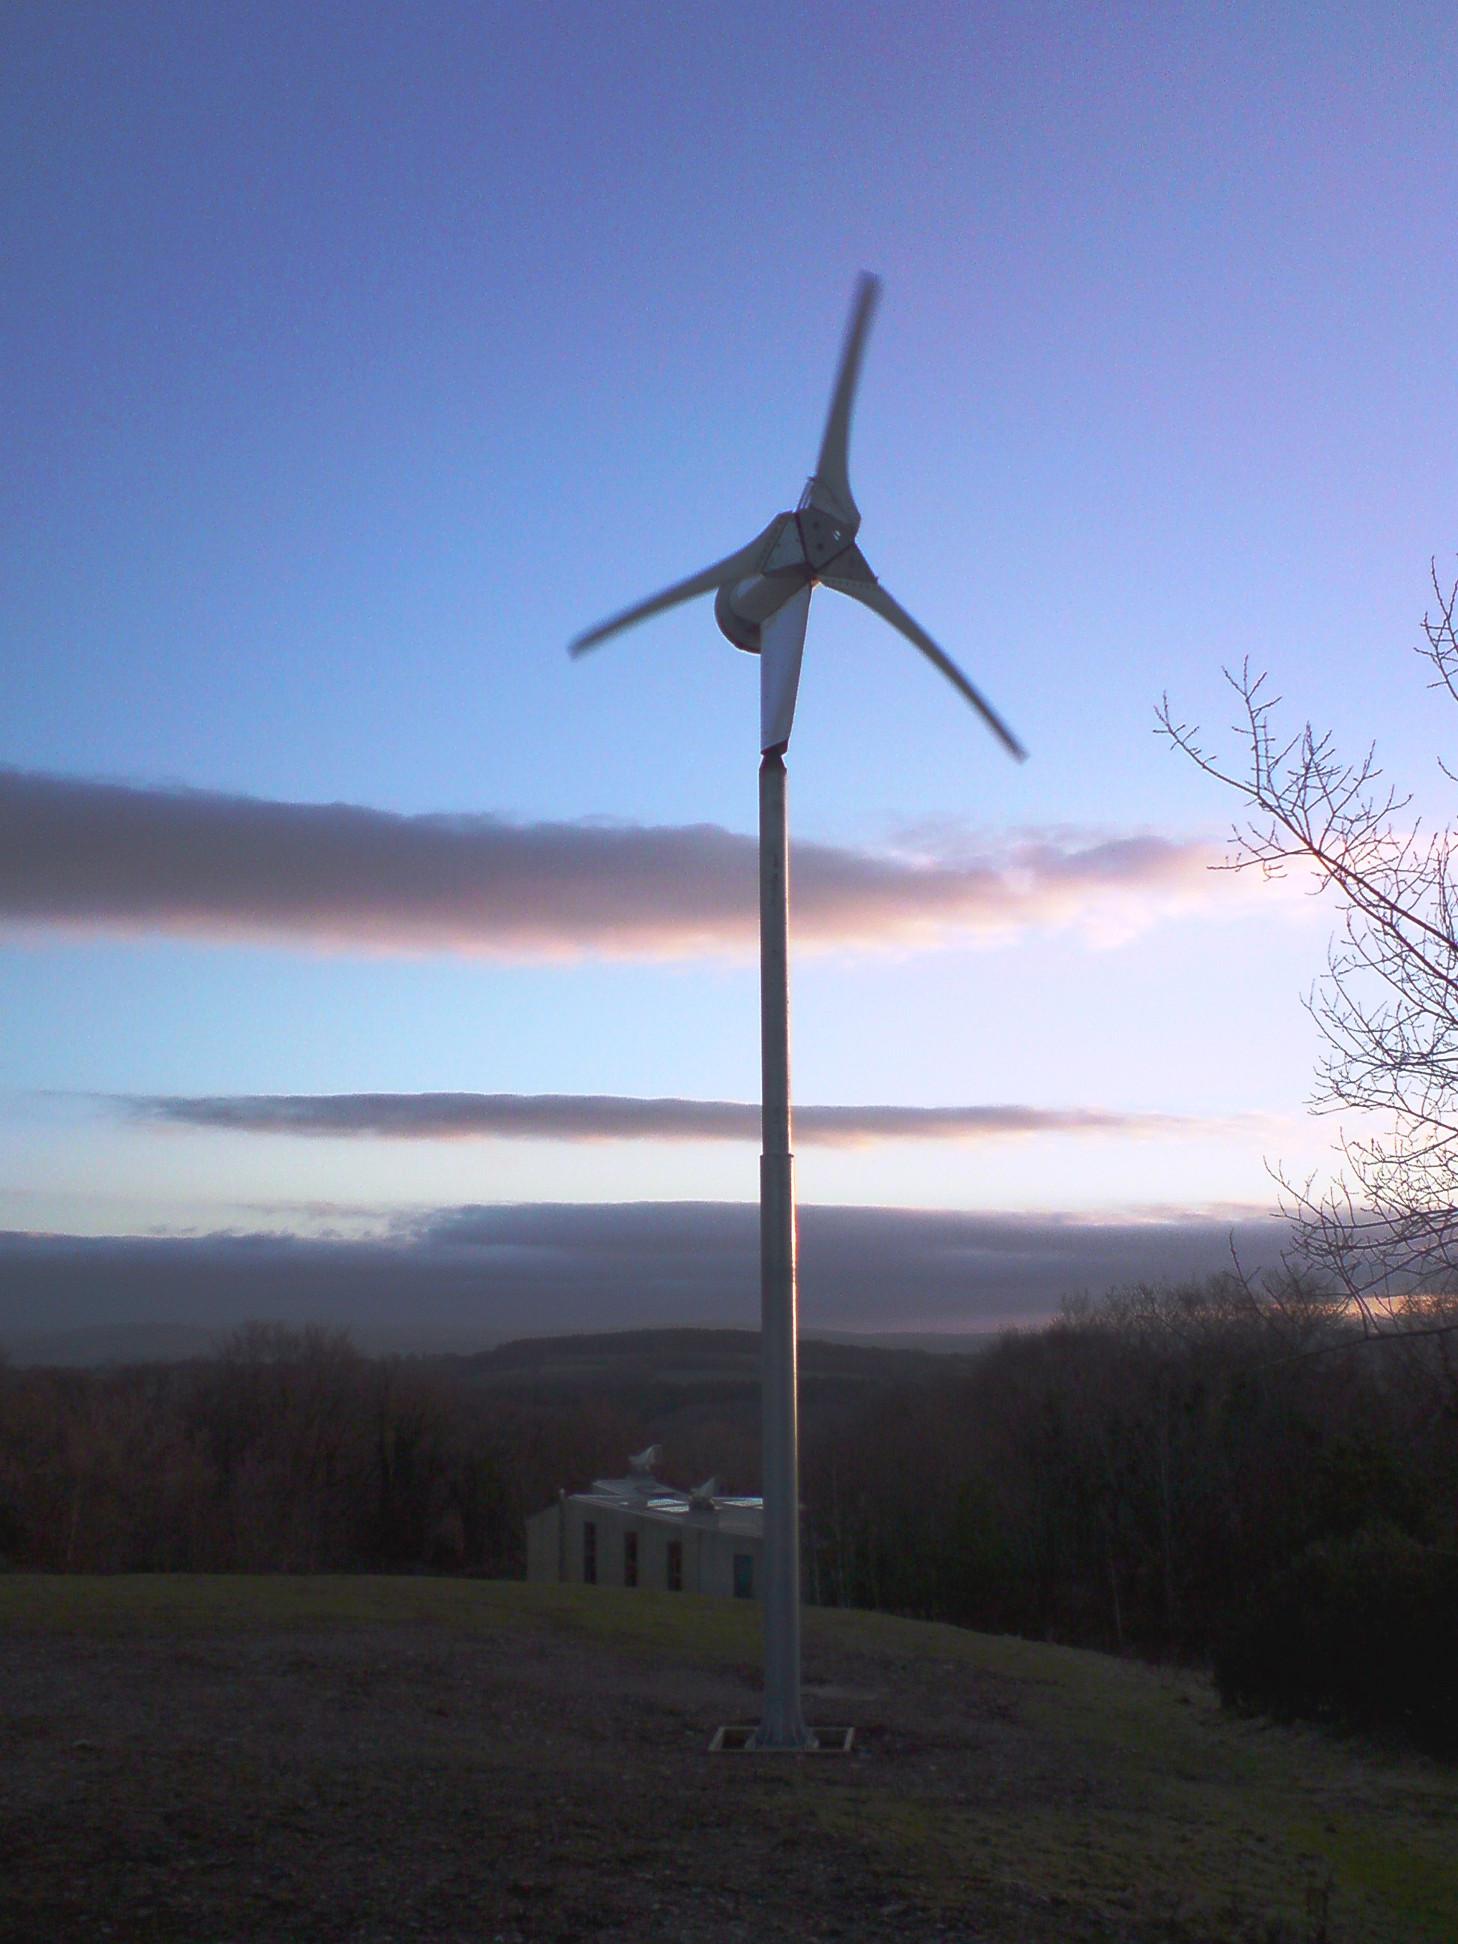 New wind turbine